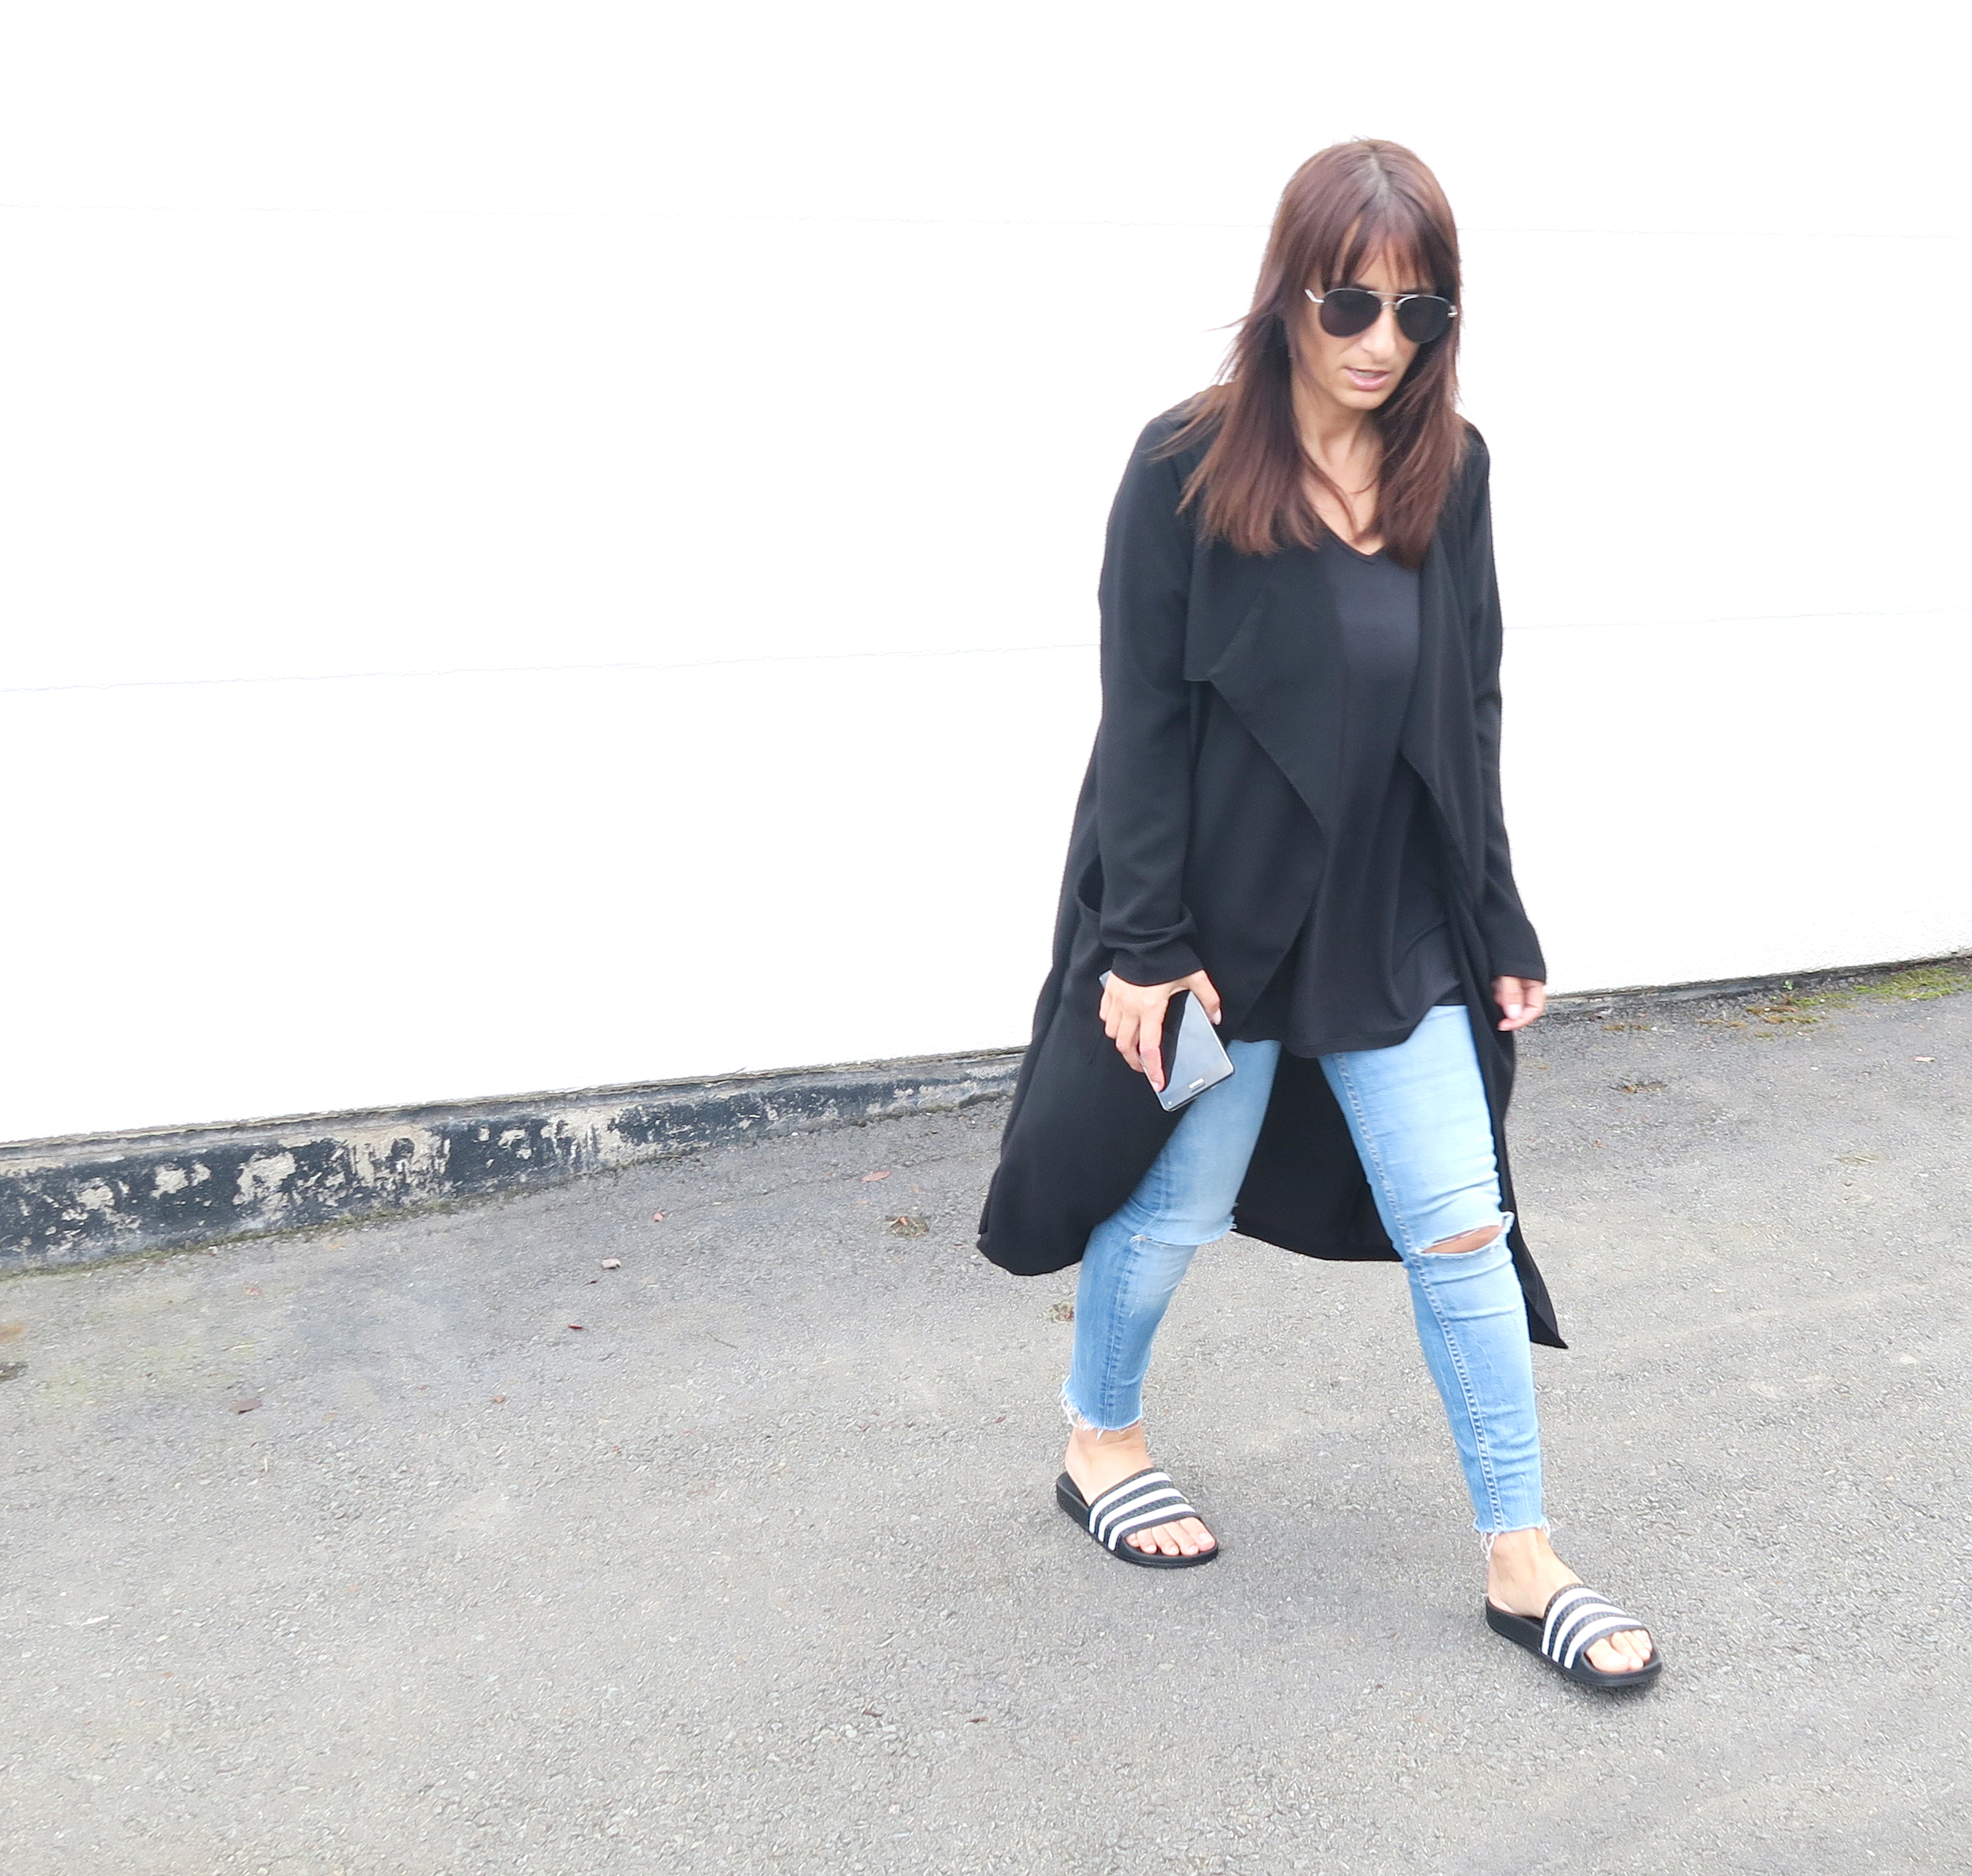 Adiletten-streetstyle-streetfashion-modesalat-fashion-outfit-blogger-7